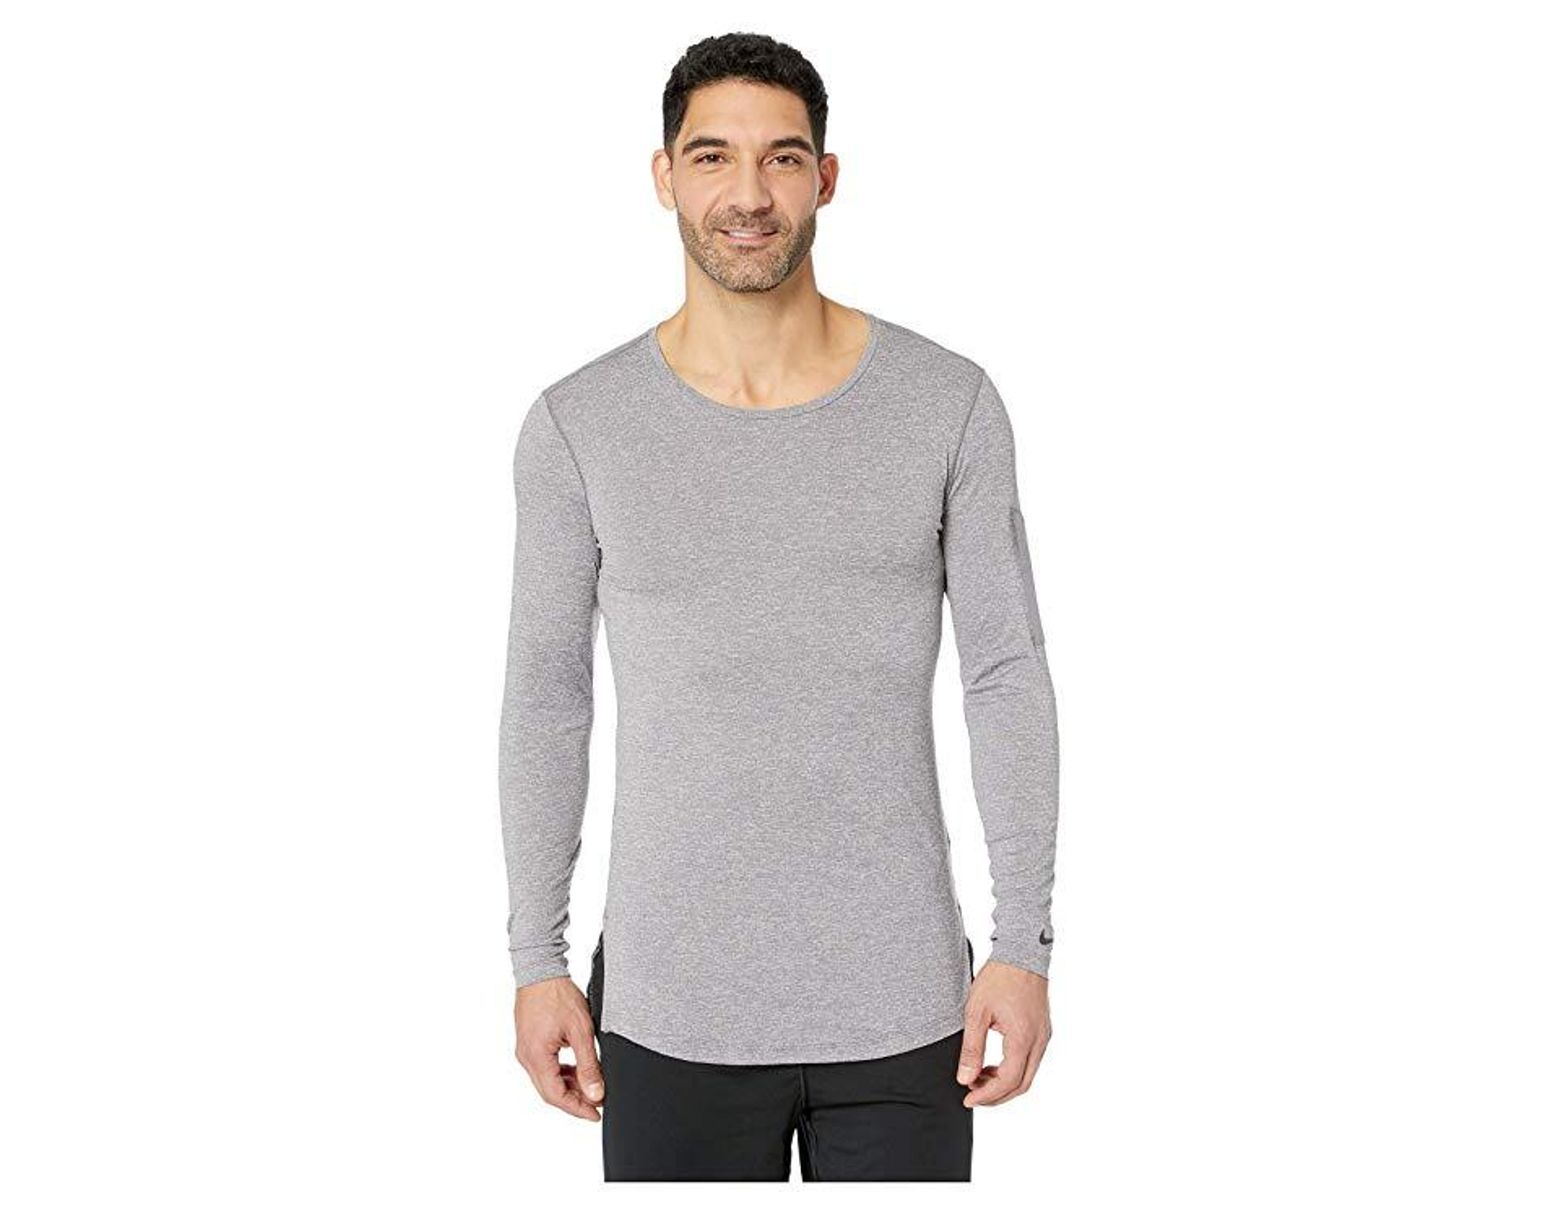 614ff715 Nike Top Long Sleeve Fitted Utility (gunsmoke/atmosphere Grey/black)  Clothing in Gray for Men - Lyst